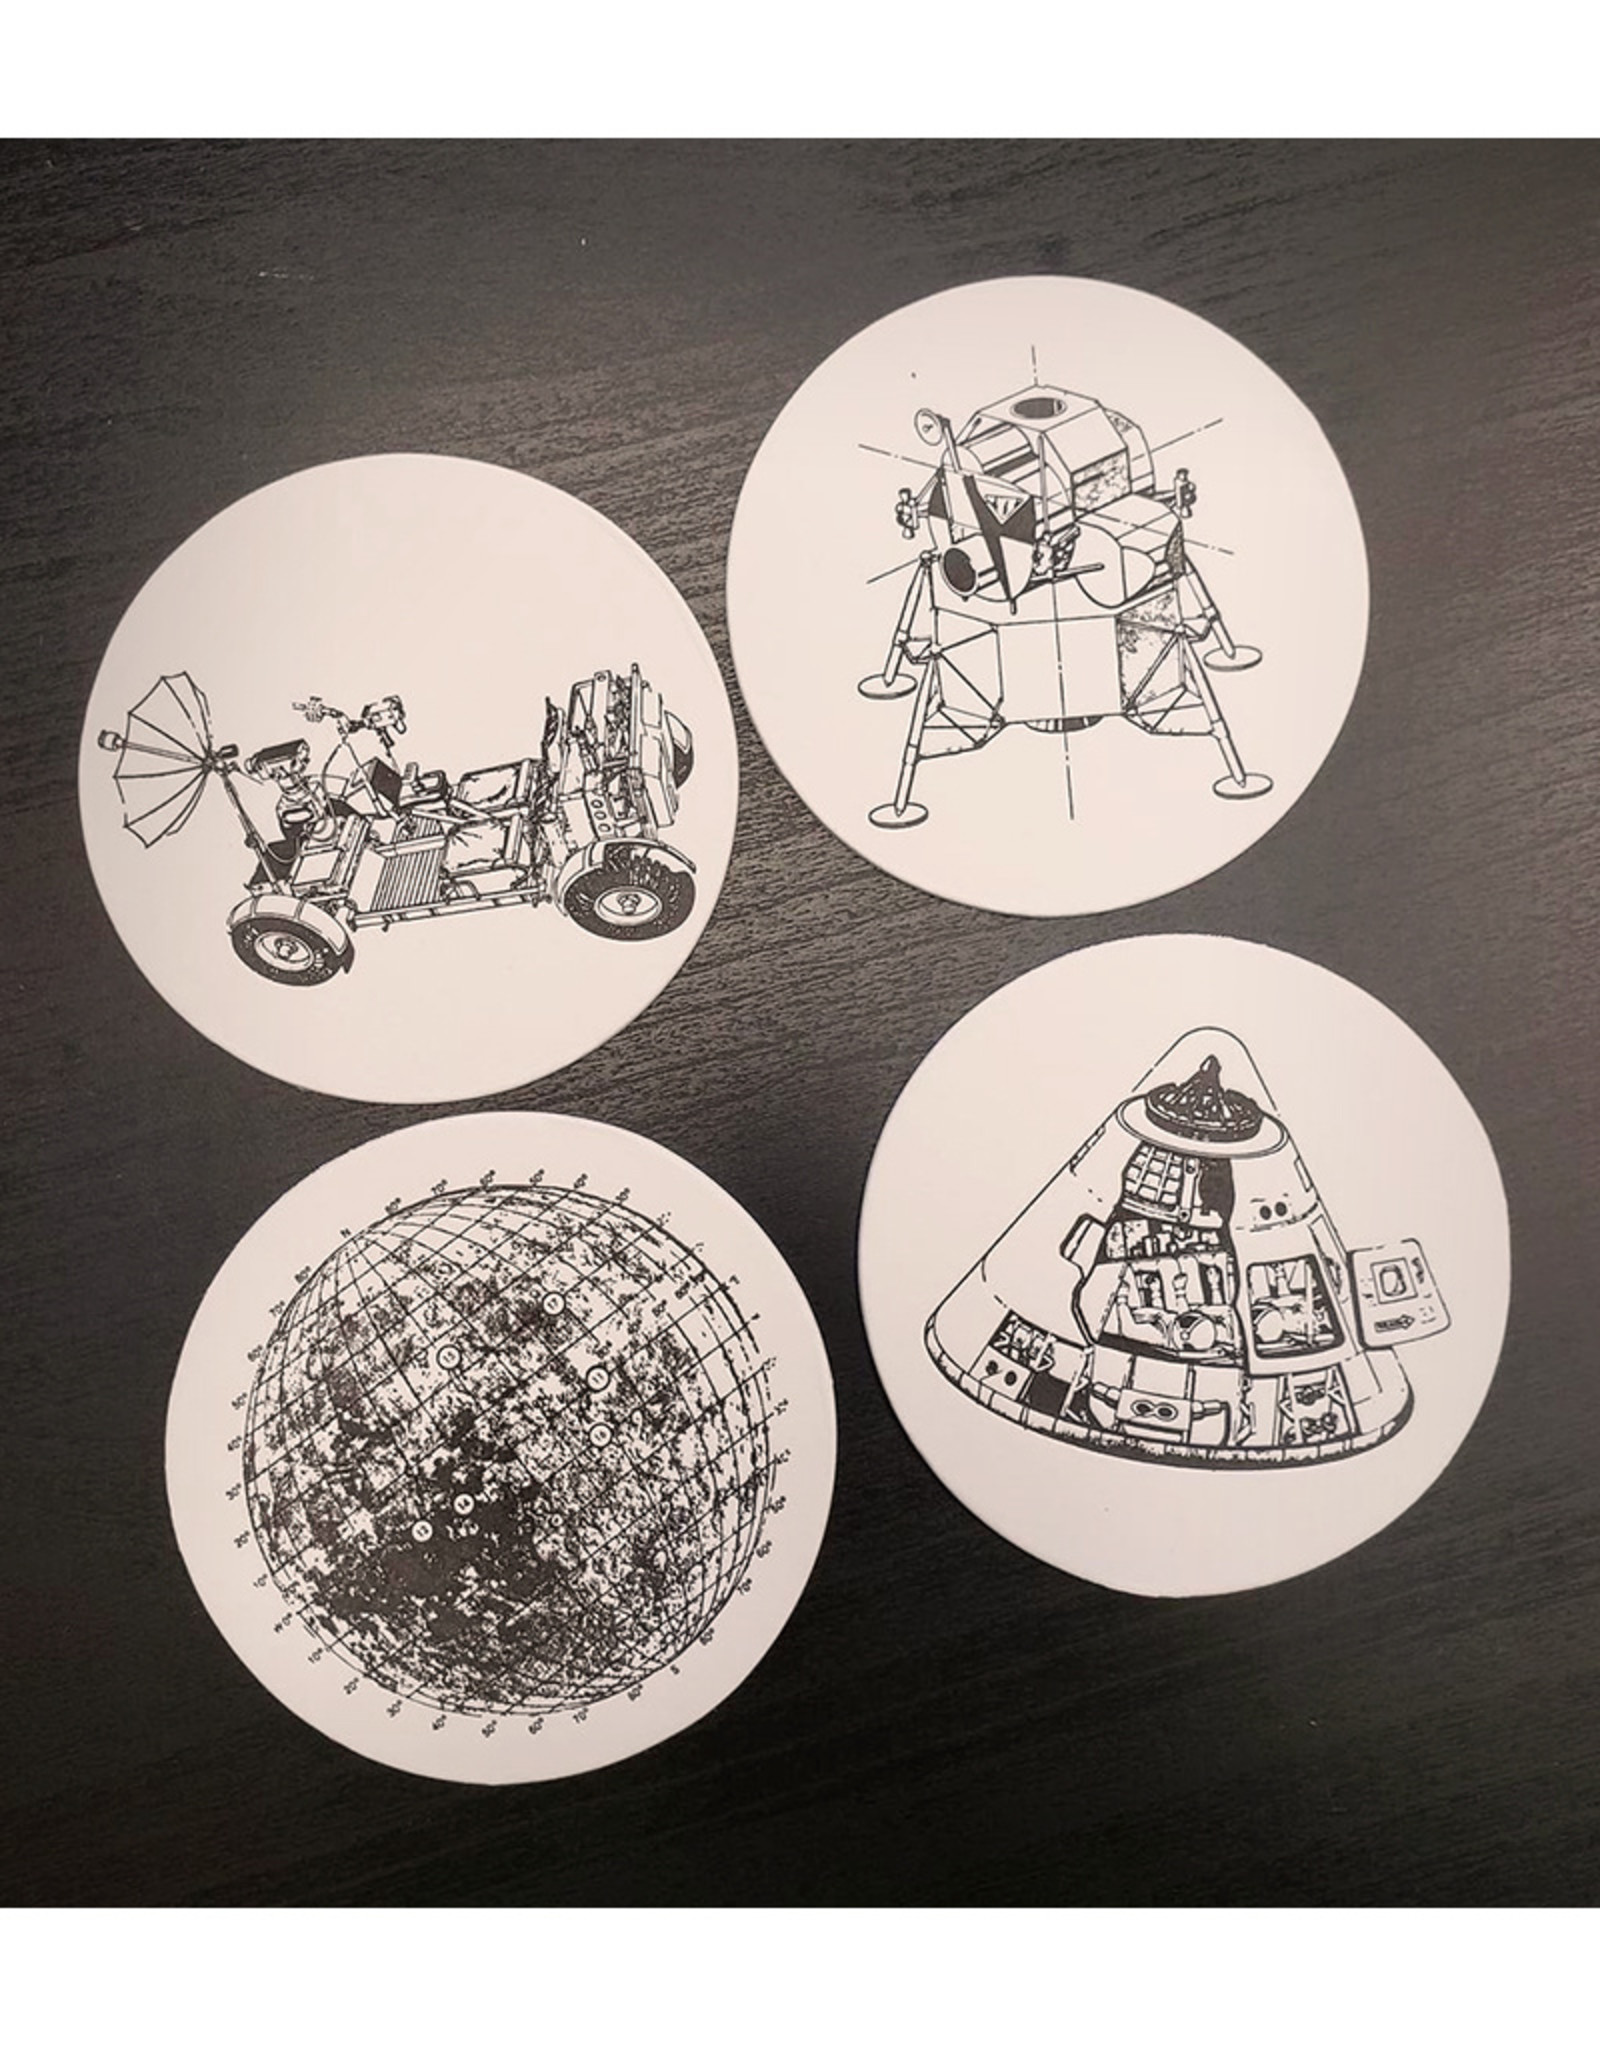 Skylab Letterpress Lunar Landing Coasters // 8 Pack by Skylab Letterpress